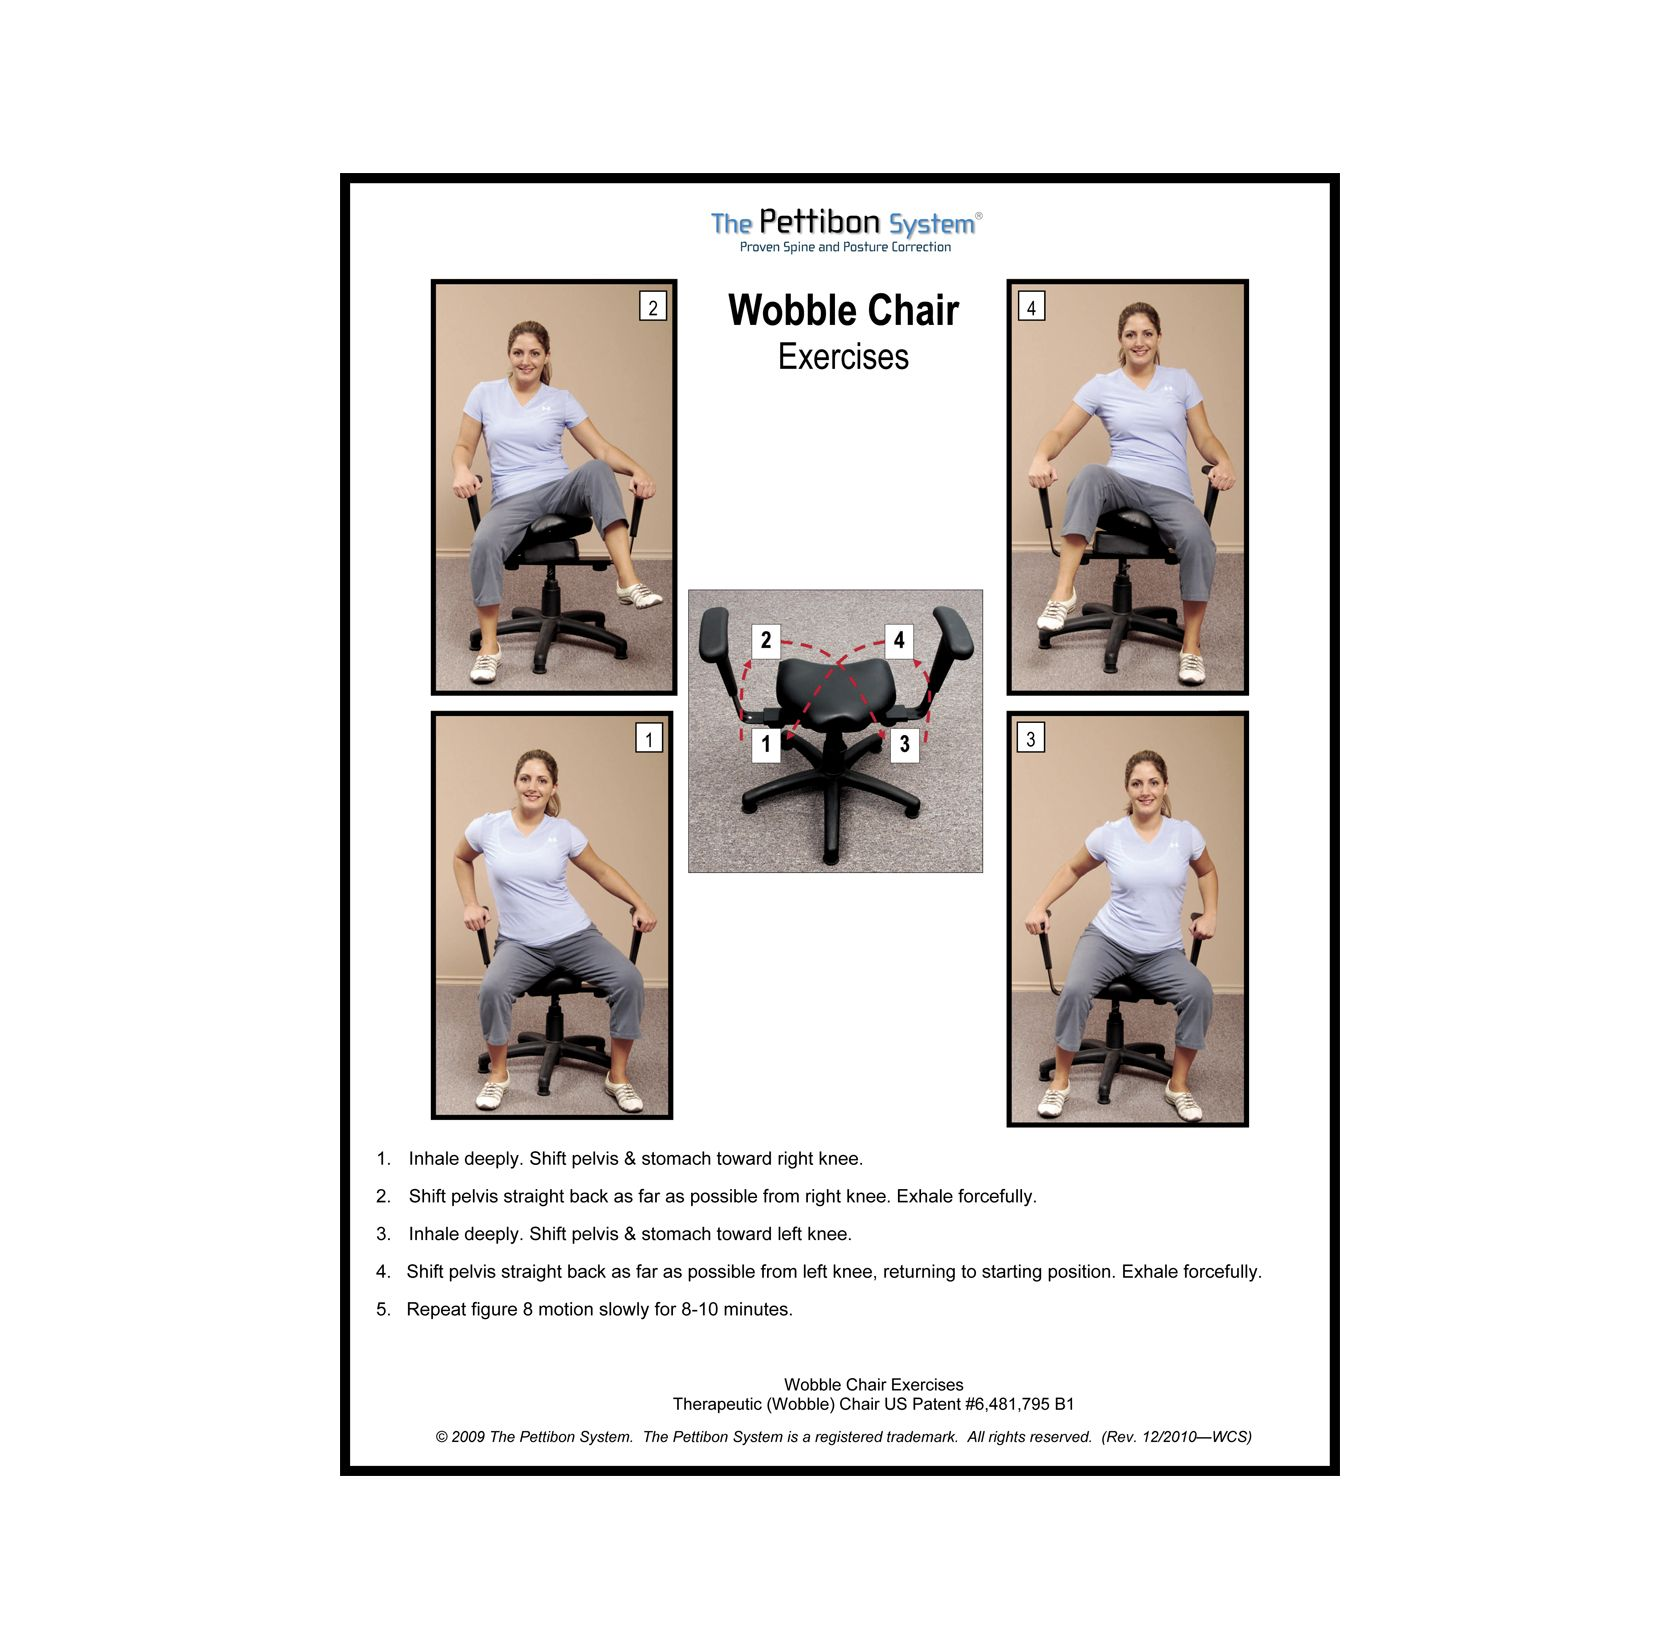 Wobble Chair Chiropractic Covers Rentals Near Me Pettibon Google Search Sugar Hill Spine